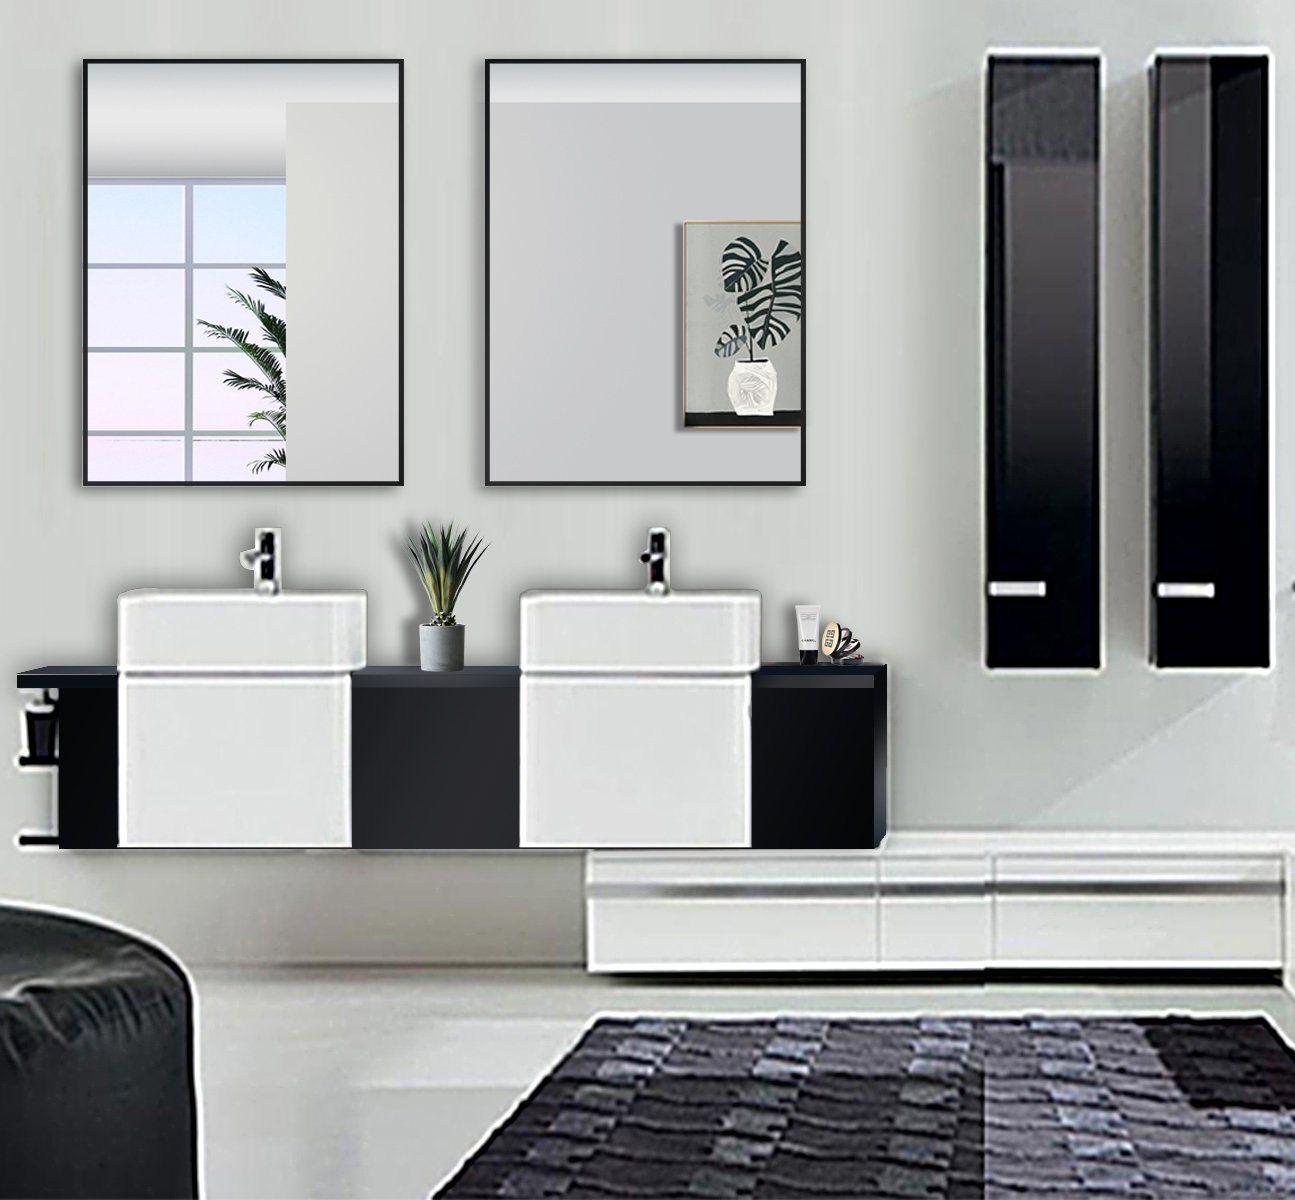 Homeswee Vanity WallMounted Bathroom Mirror Environmental